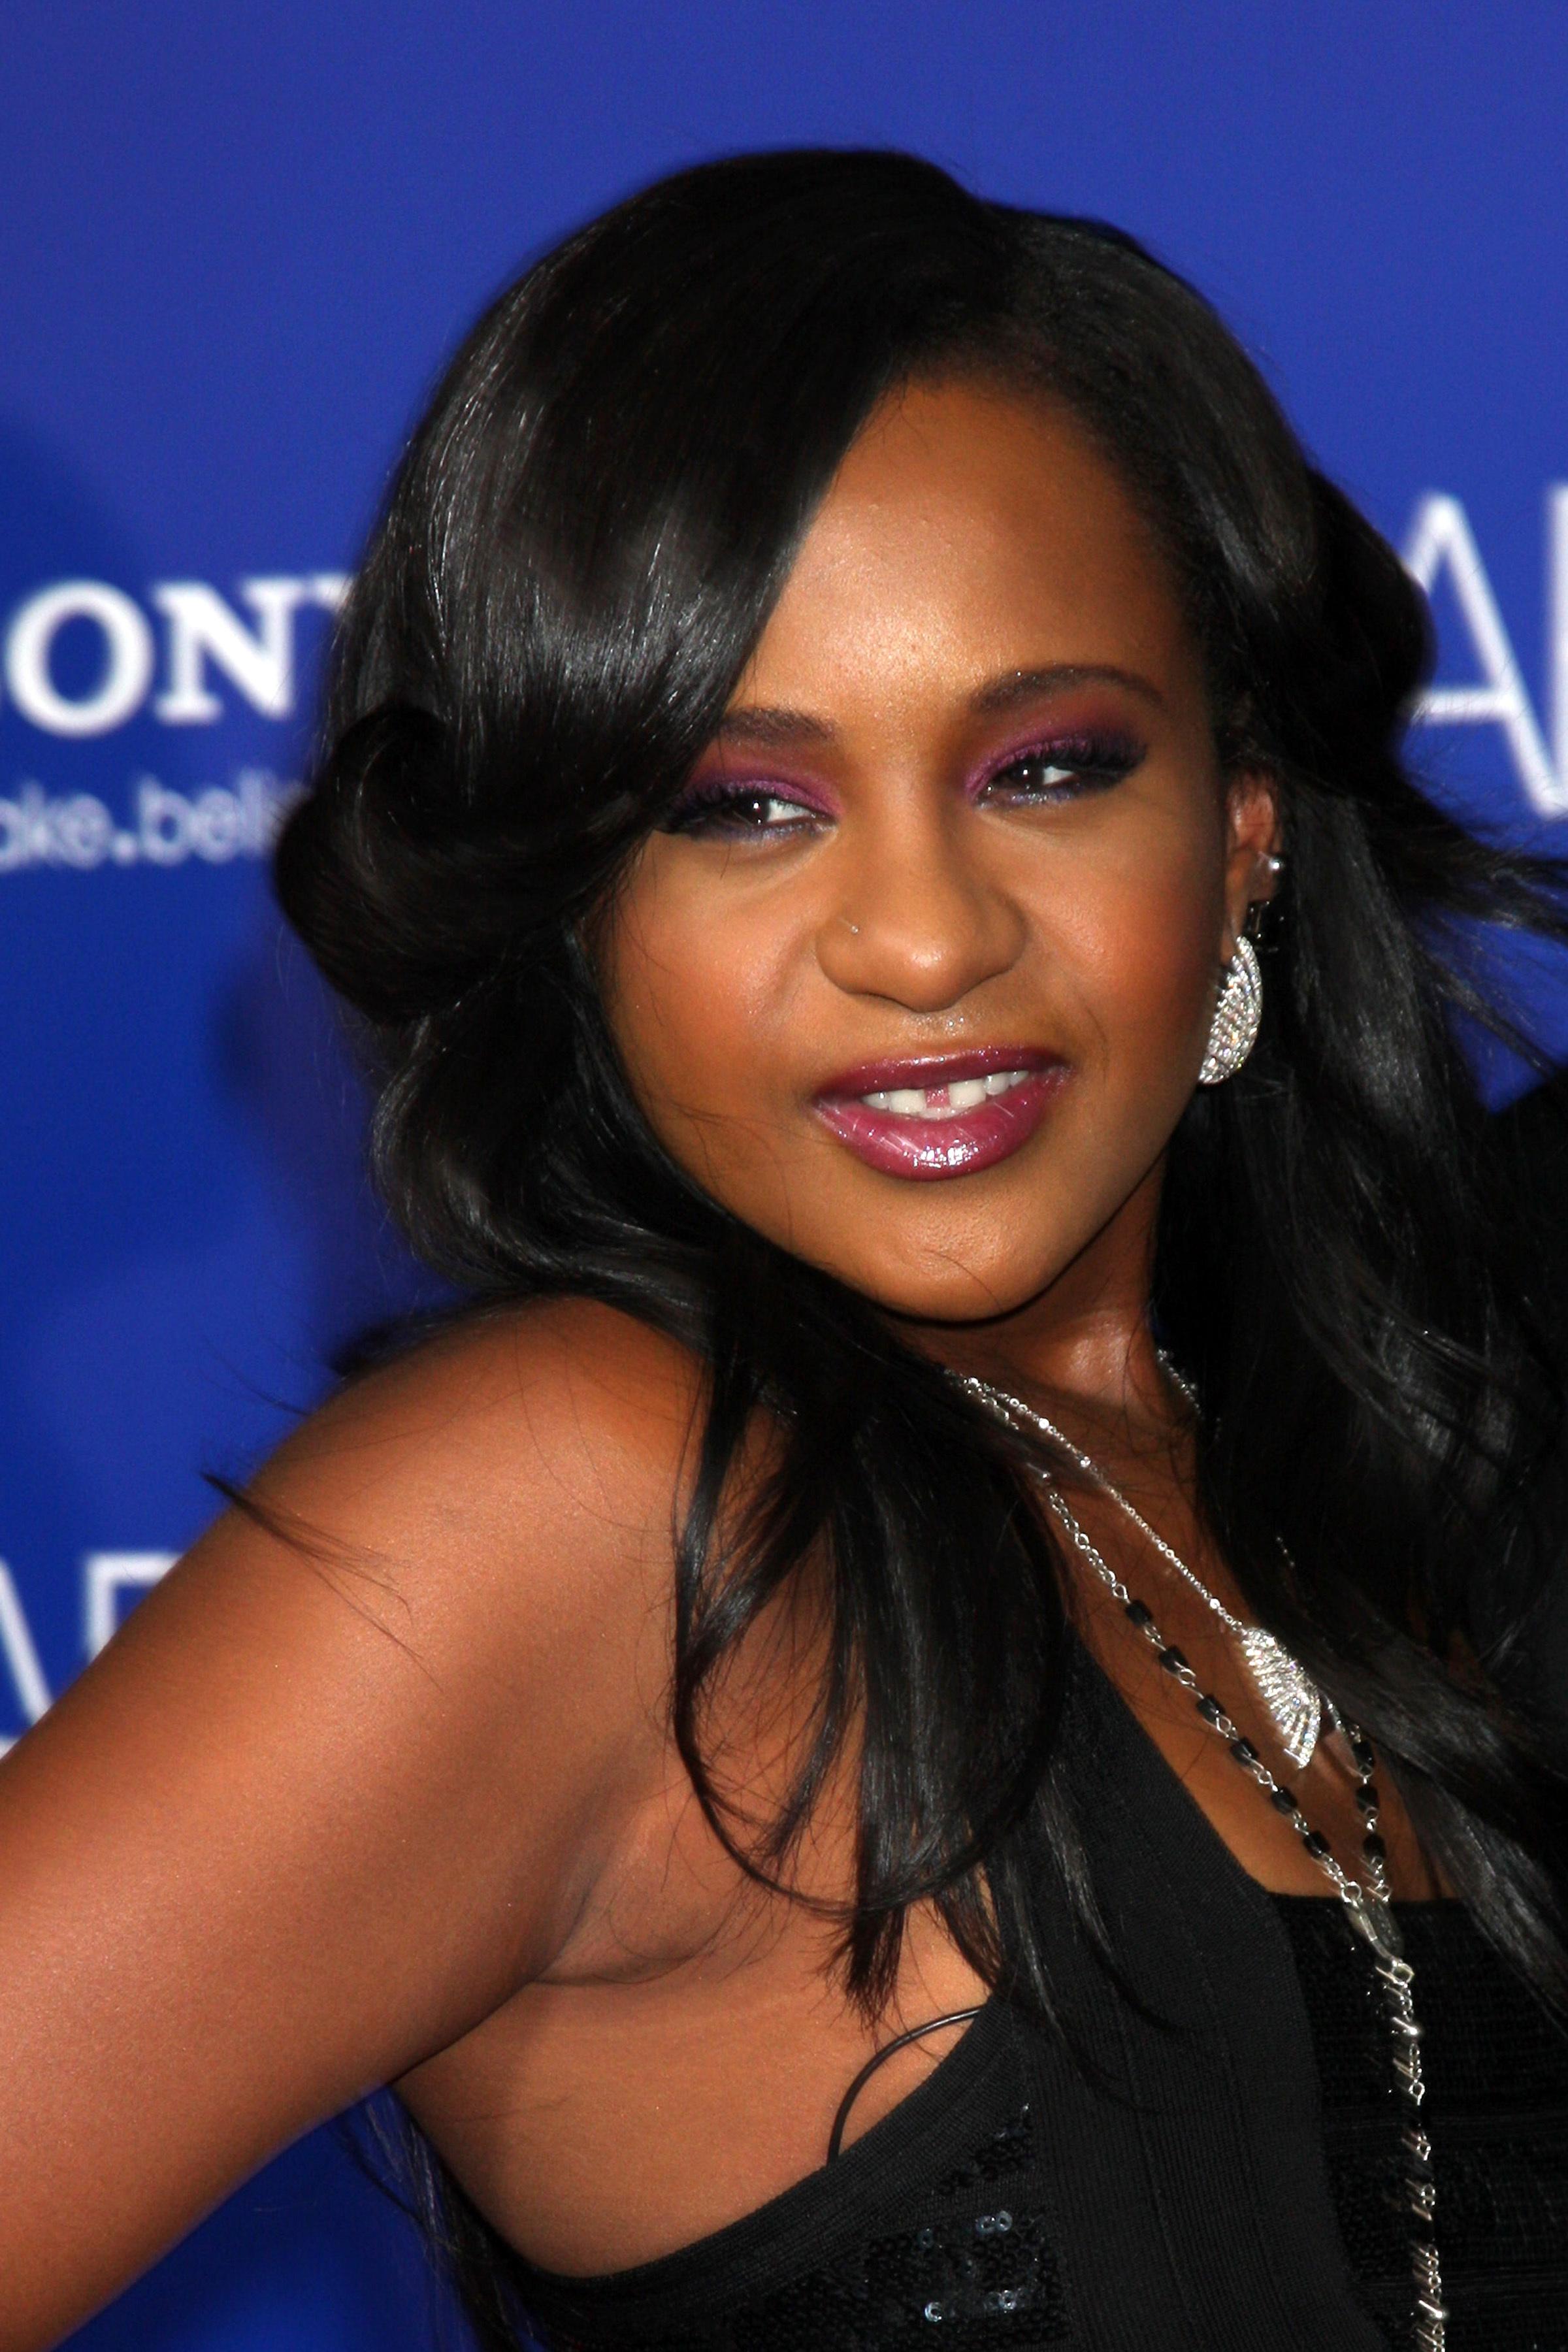 Fiica lui Whitney Houston a fost implicata intr-un accident de masina